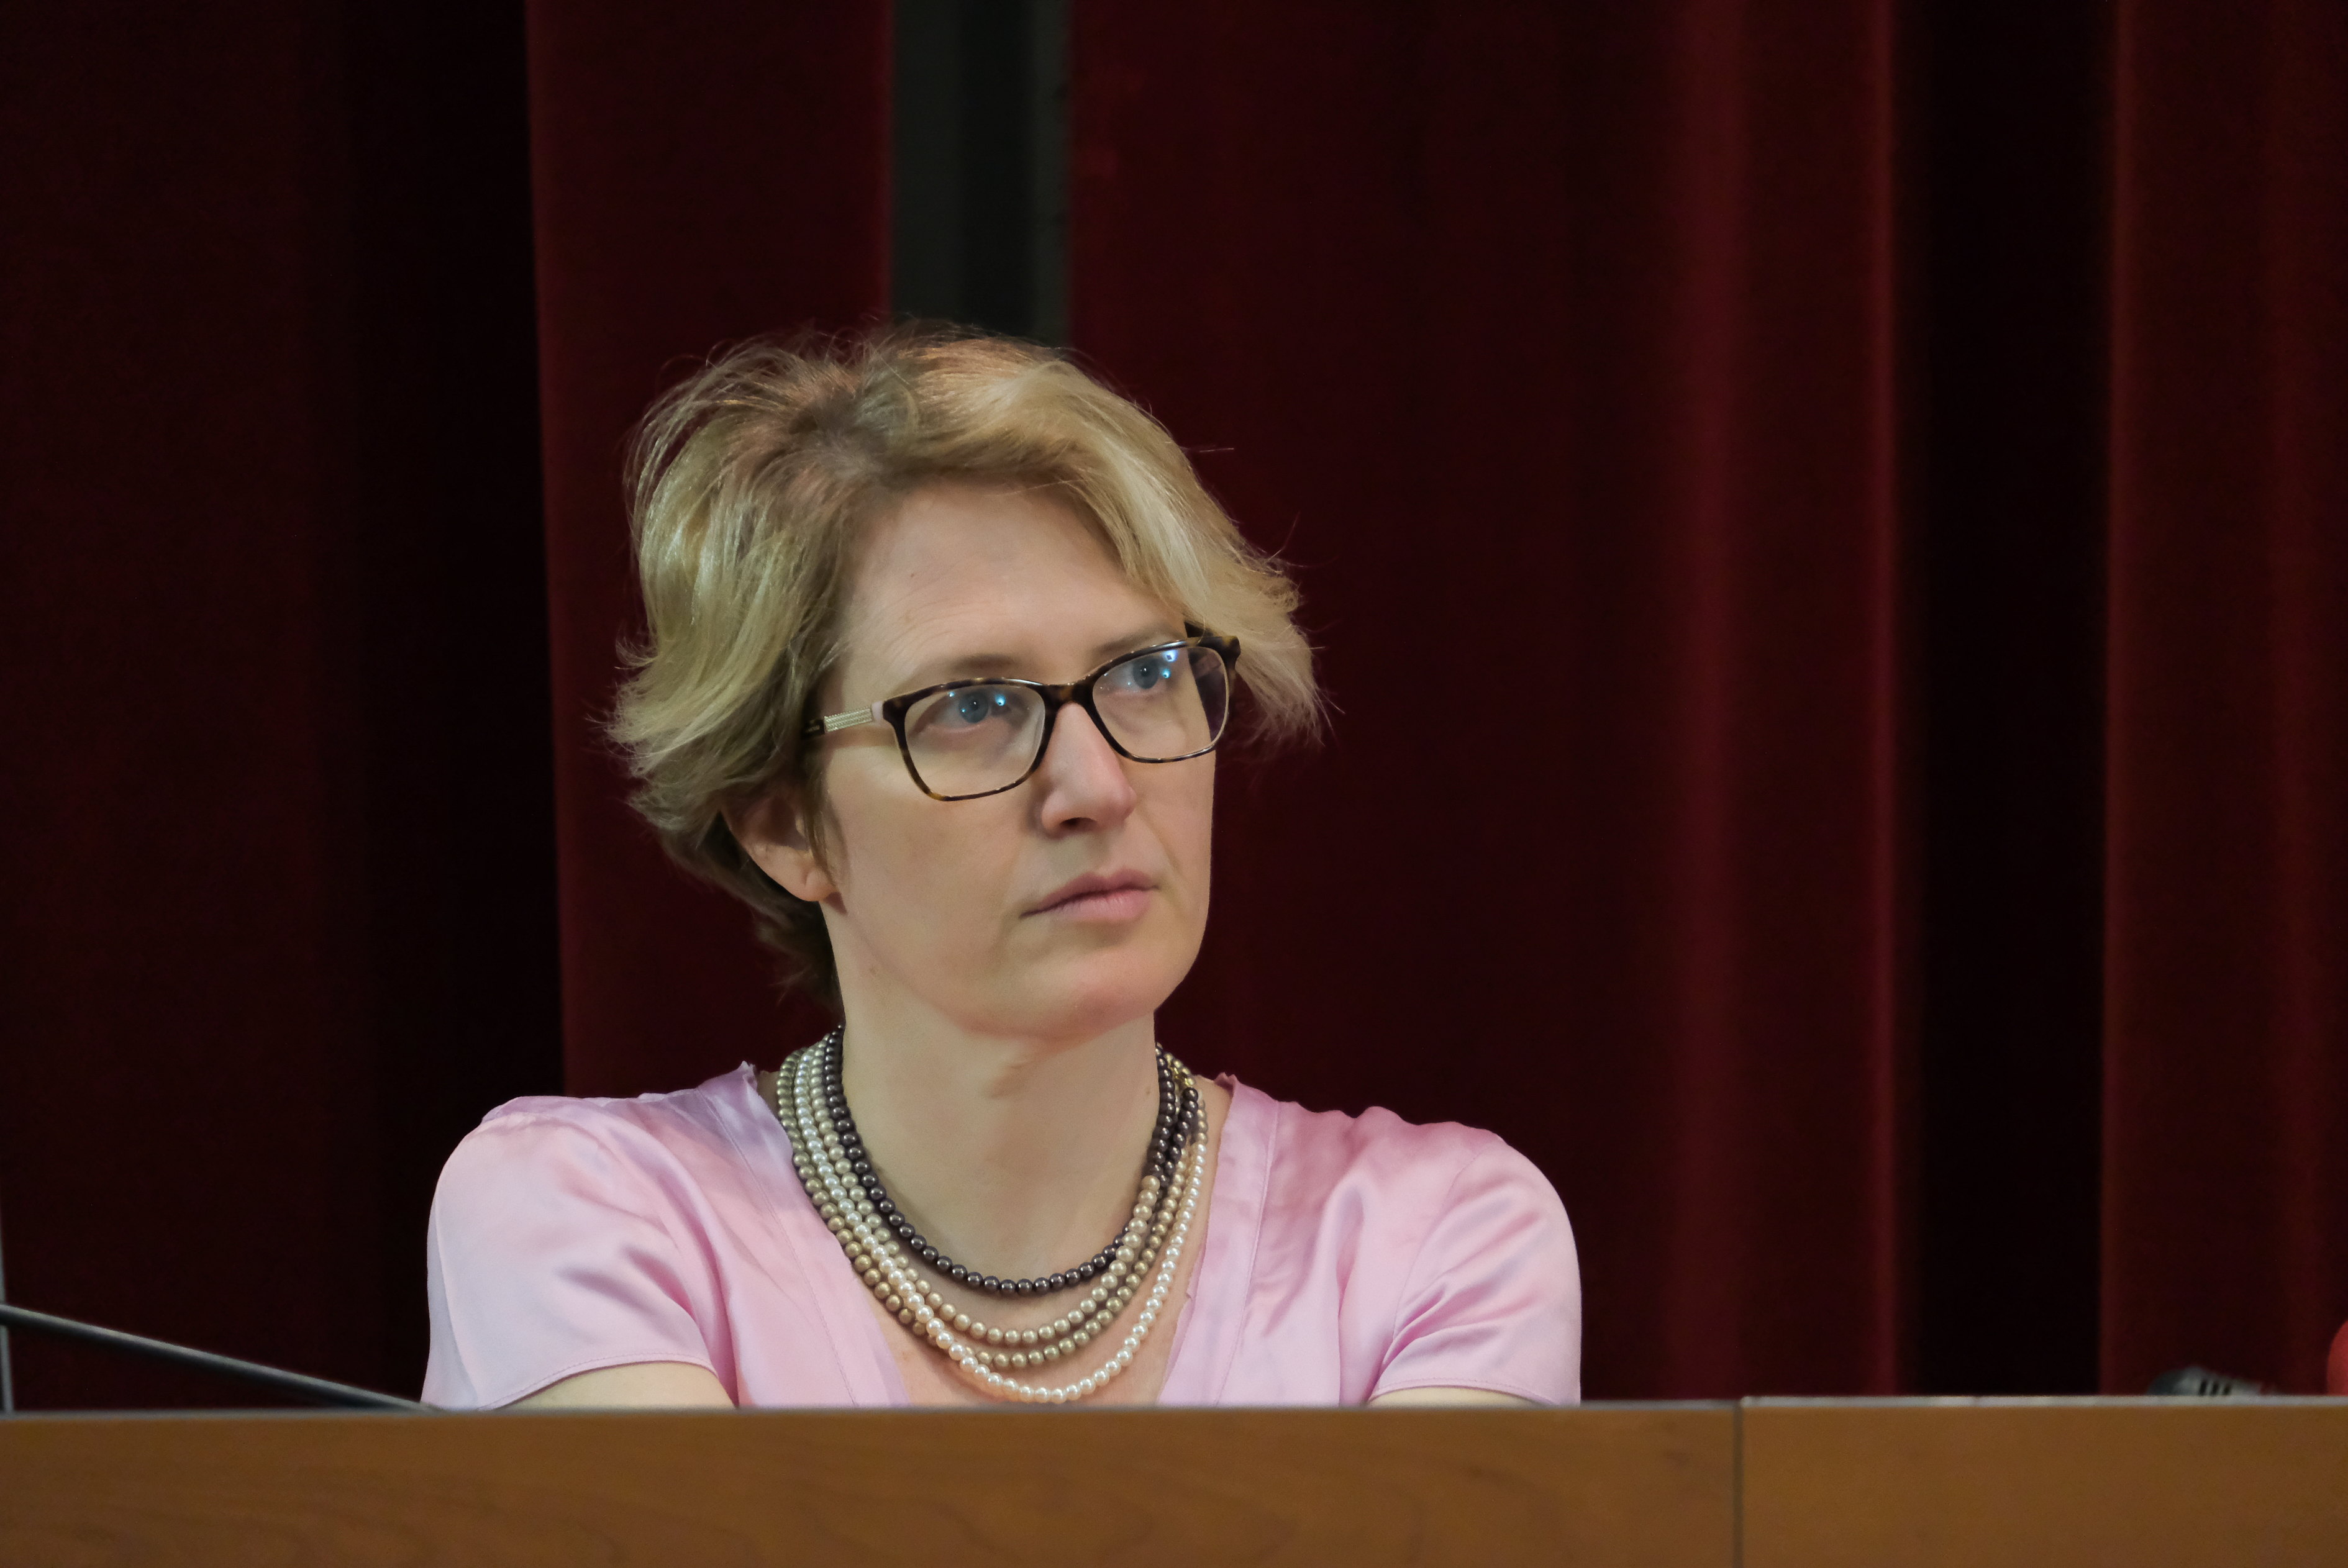 Roberta Pizzochera, assessore ai Servizi Sociali